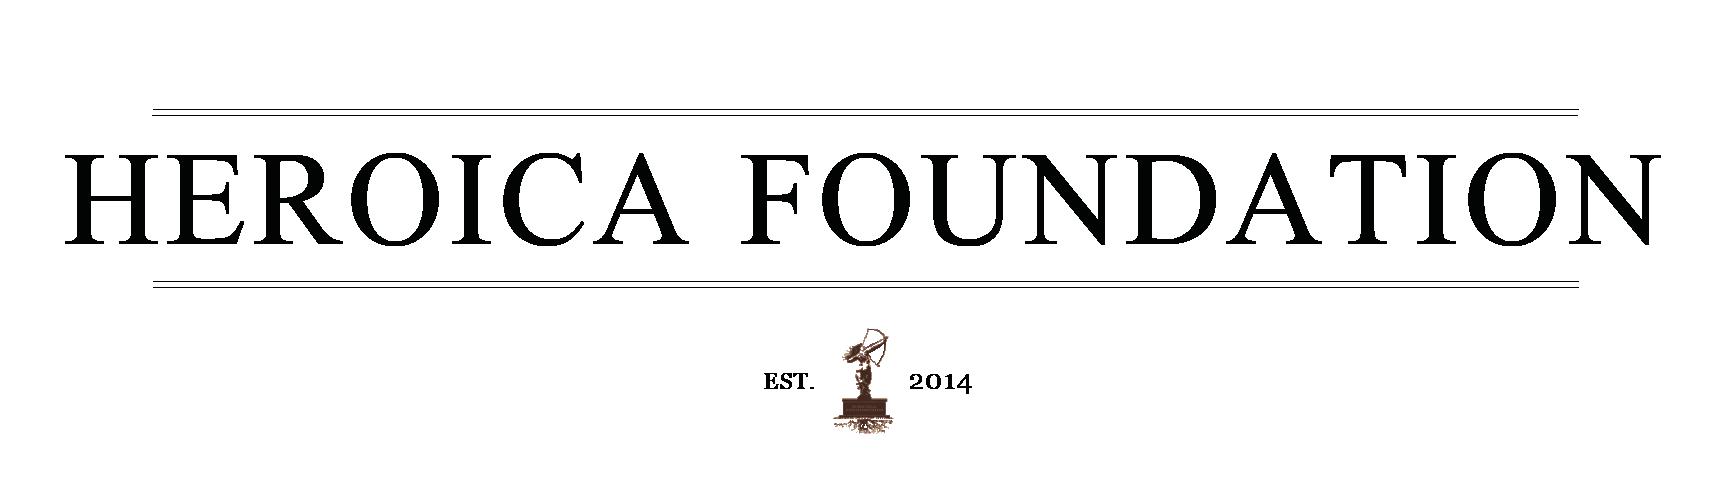 Heroica Foundation